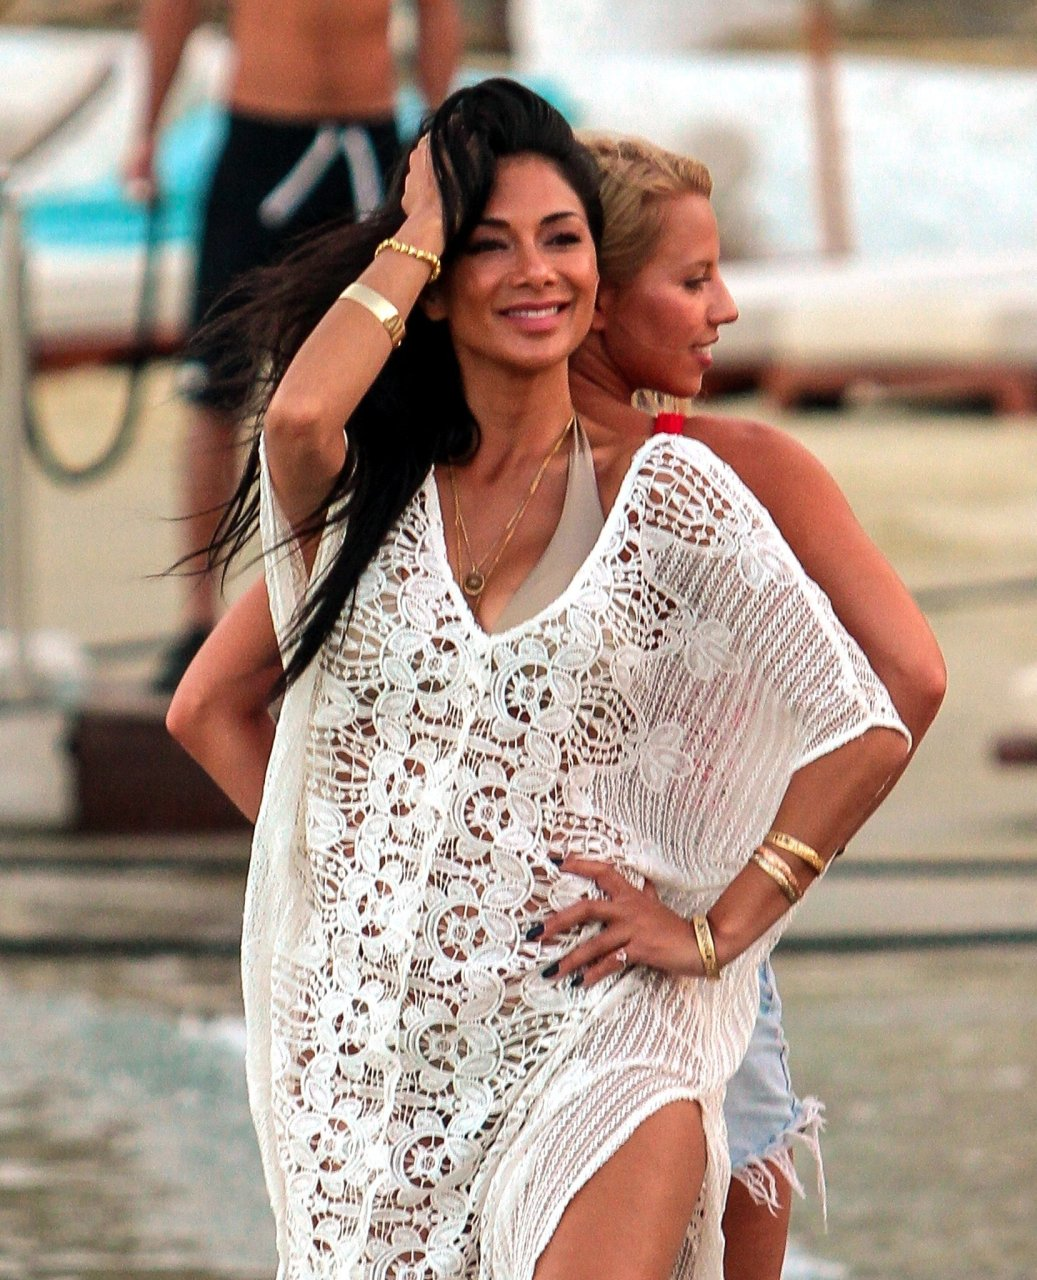 Nicole-Scherzinger-Sexy-TheFappeningBlog.com-22-1.jpg